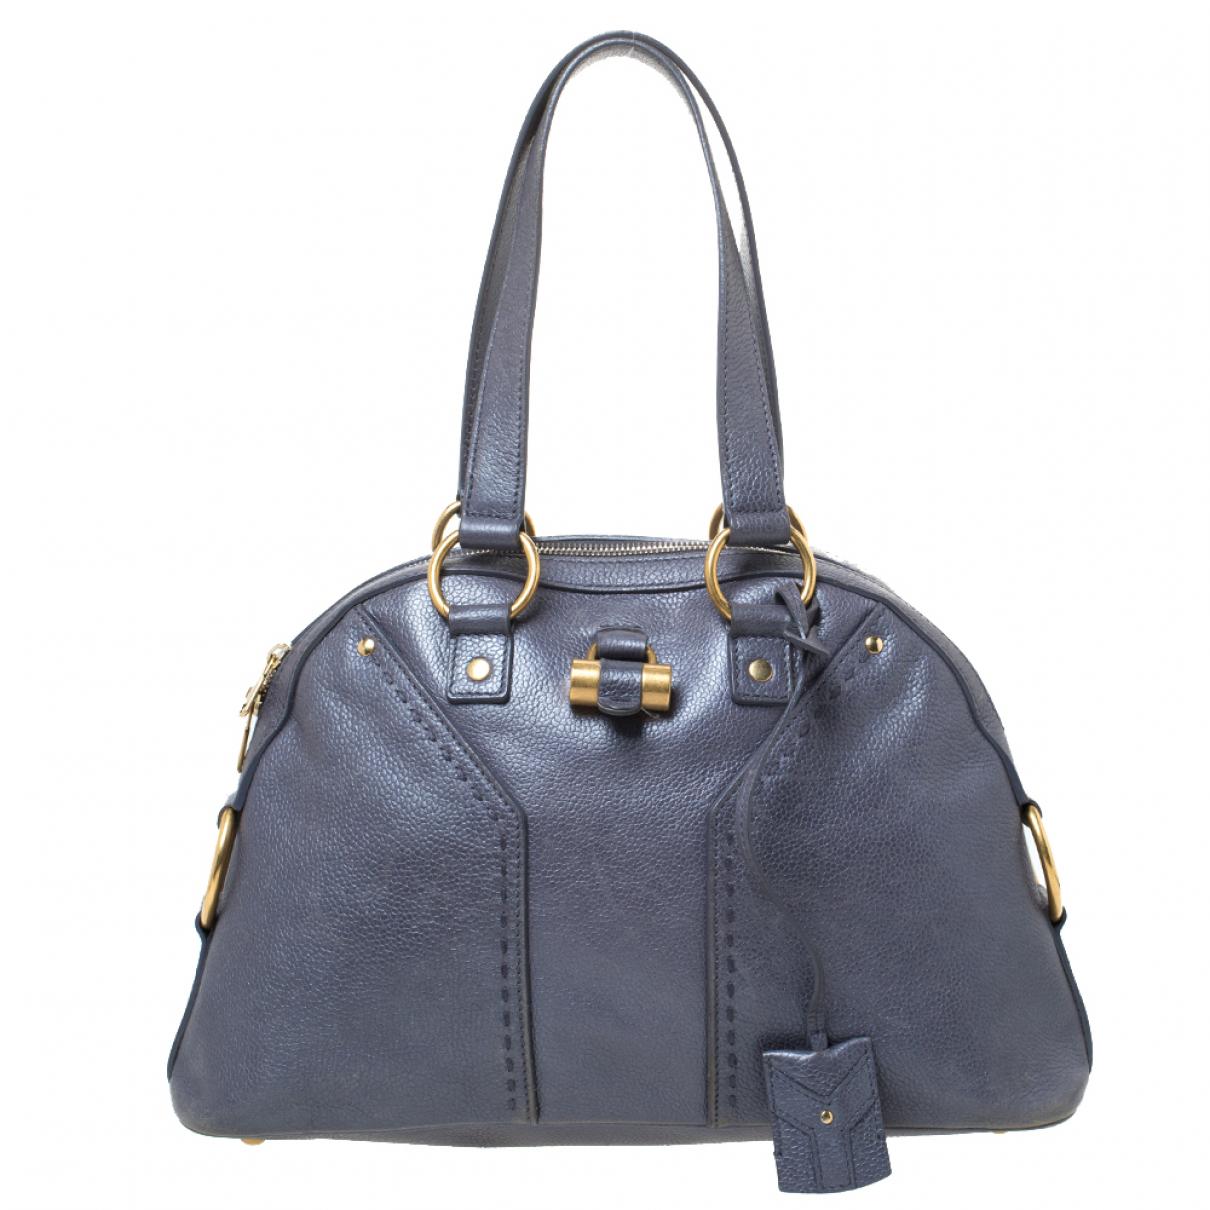 Saint Laurent \N Grey Leather handbag for Women \N